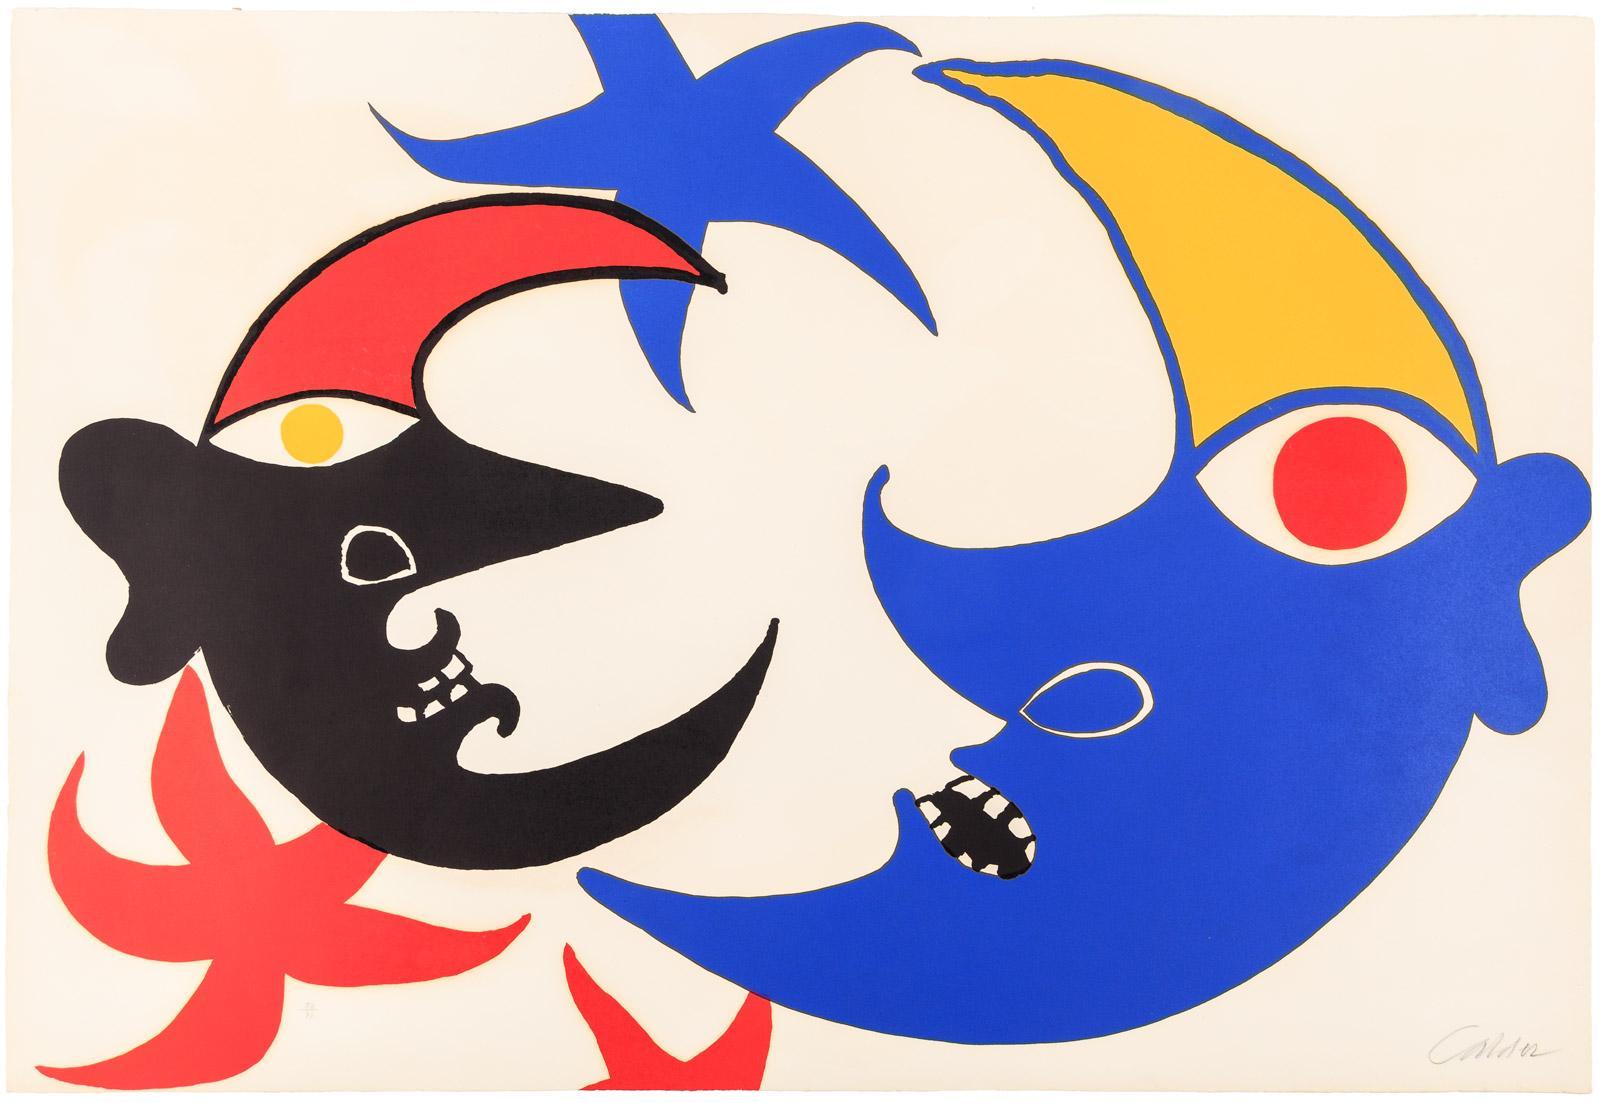 Alexander calder clipart graphic free Alexander Calder - Two Moons (Les Deux Lunes) - Modernist Icon ... graphic free